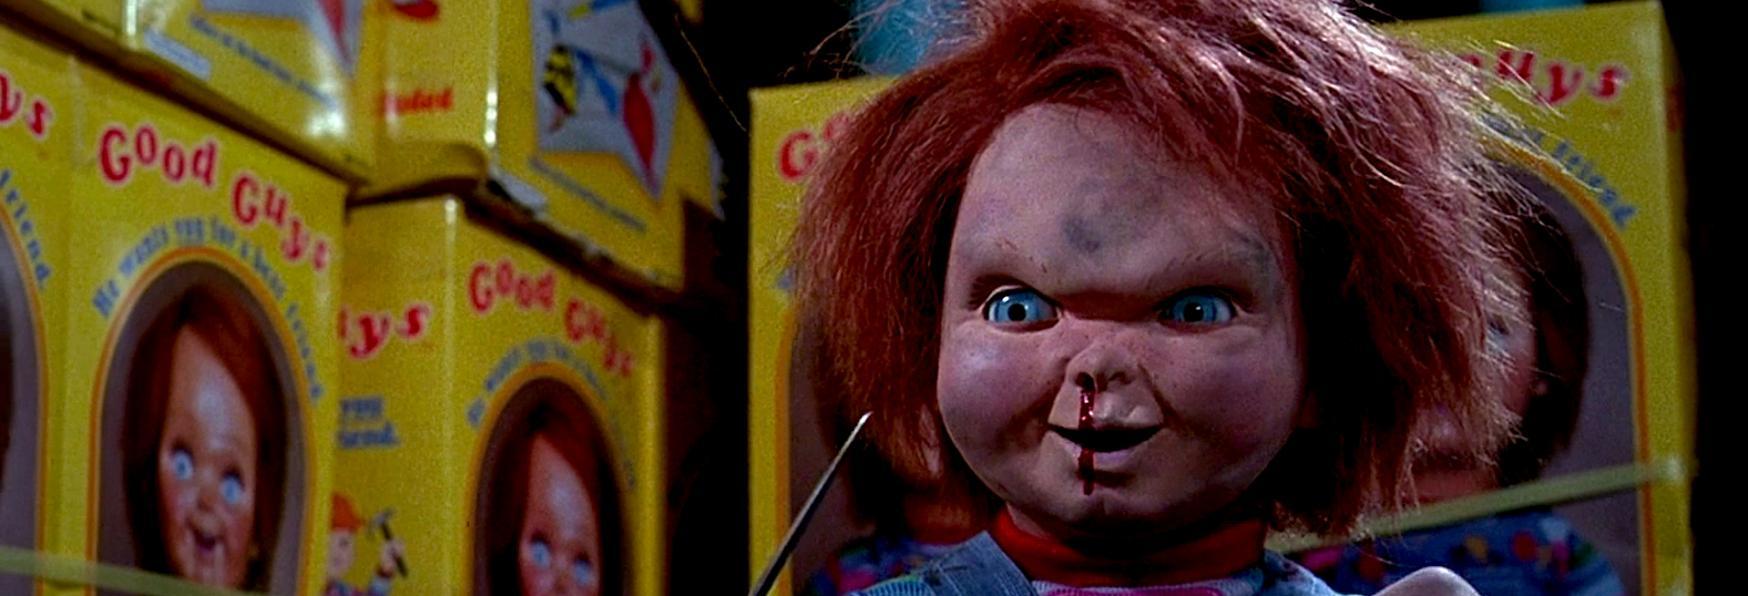 Chucky la saga